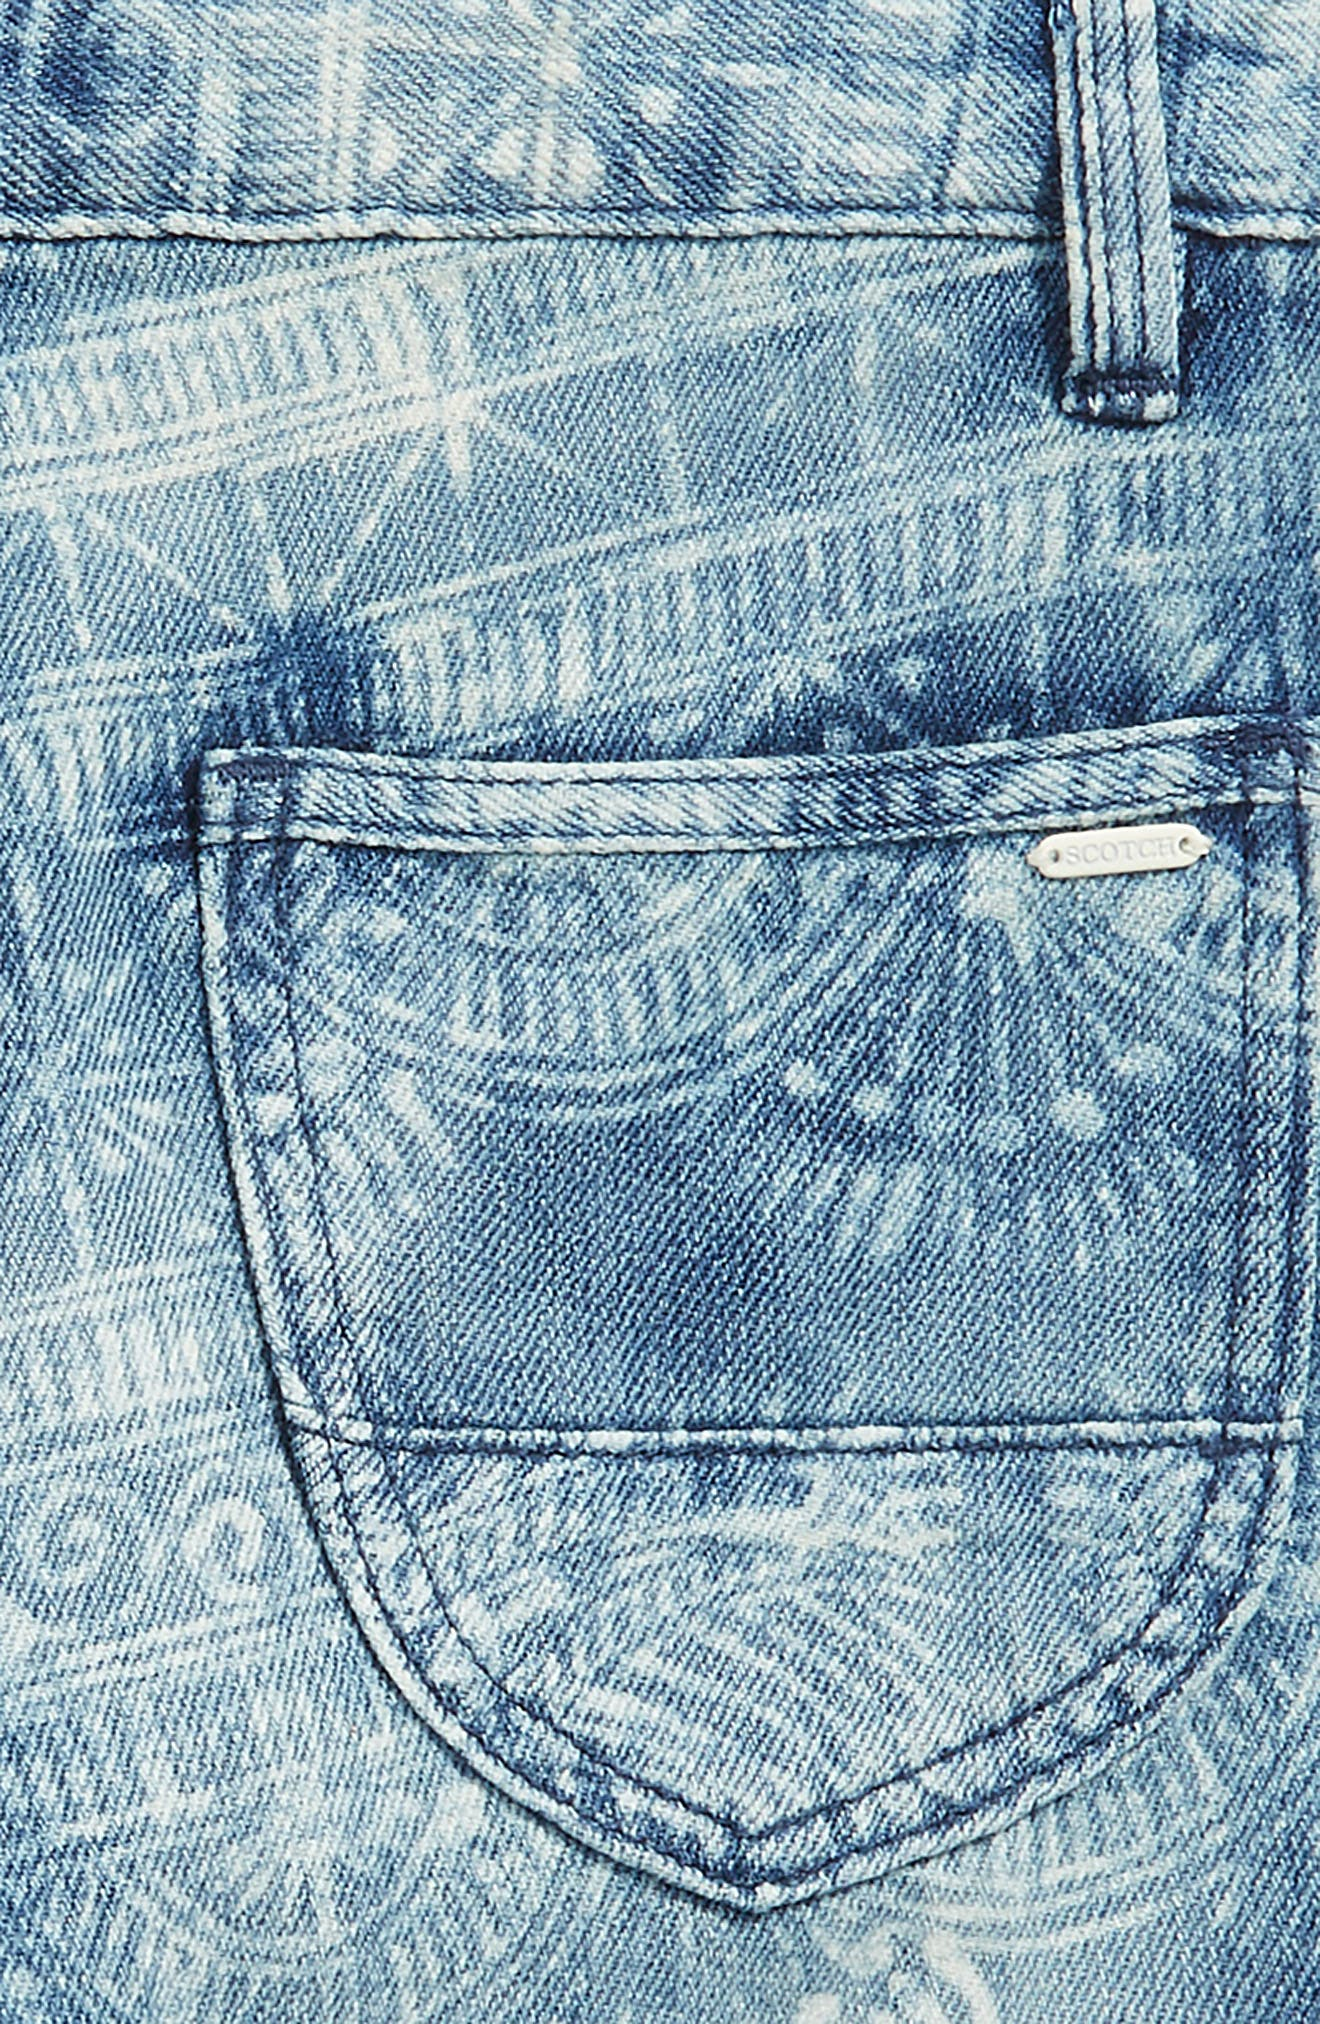 Denim Chino Shorts,                             Alternate thumbnail 3, color,                             400